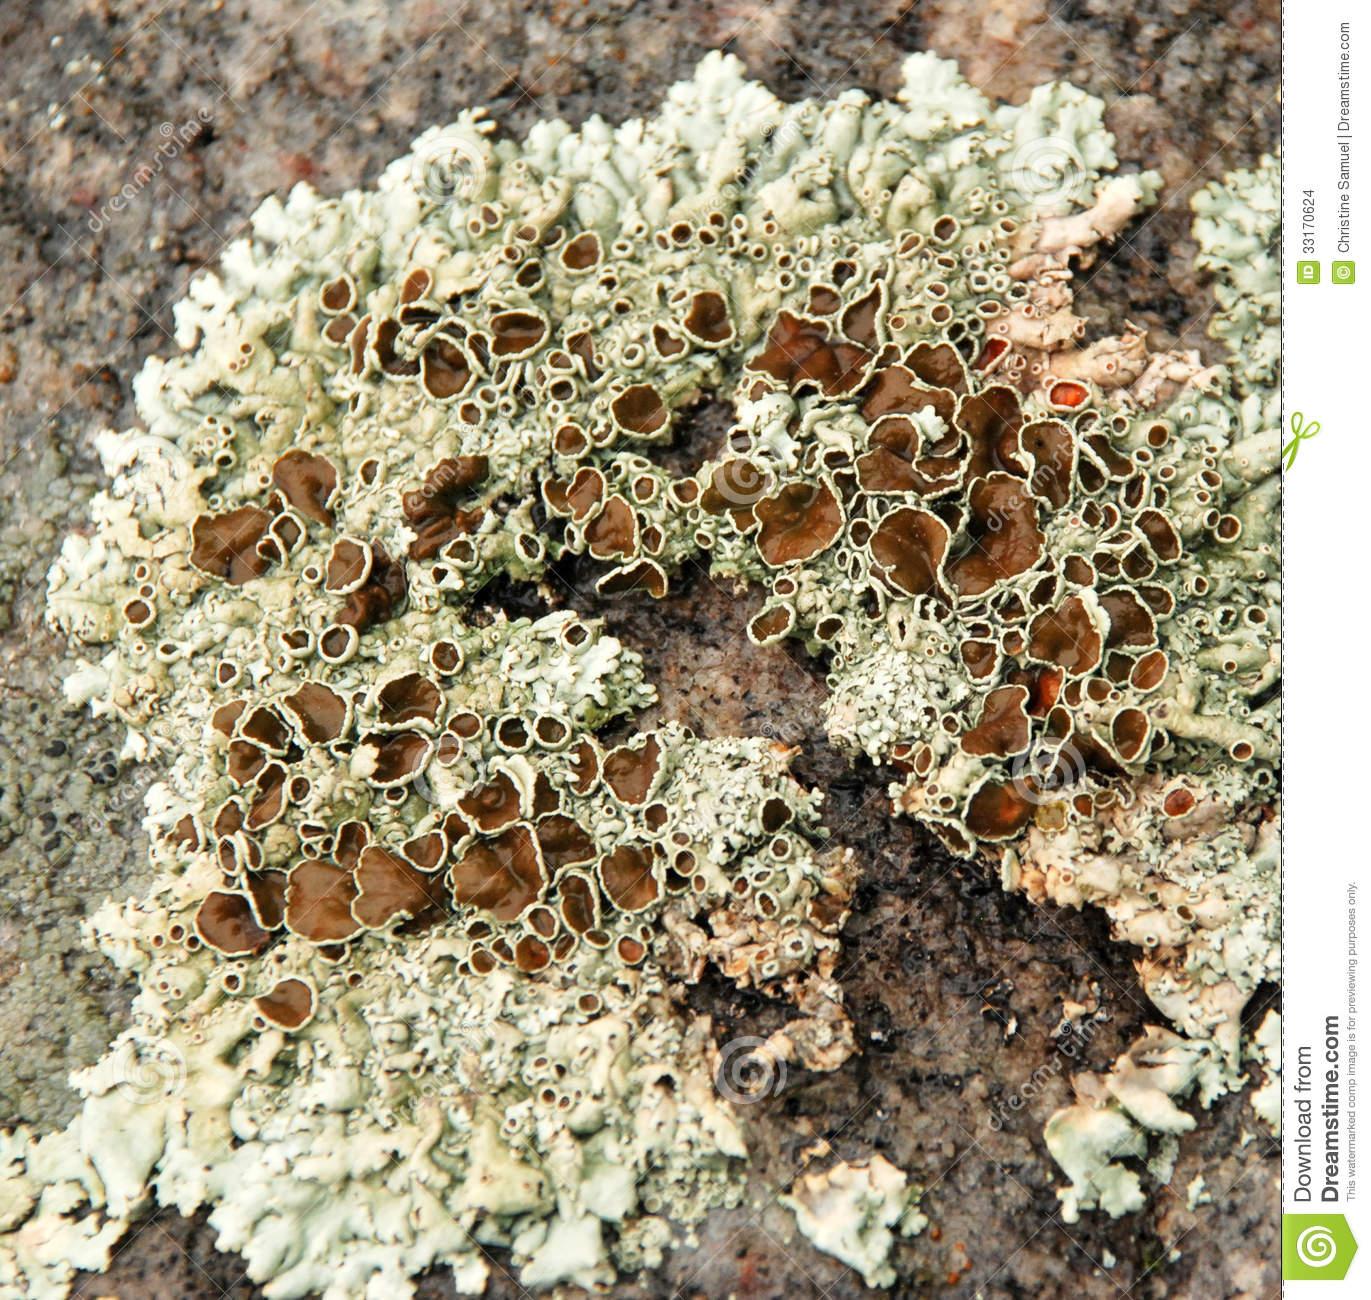 Crusty Lichen Algae Texture Stock Images.